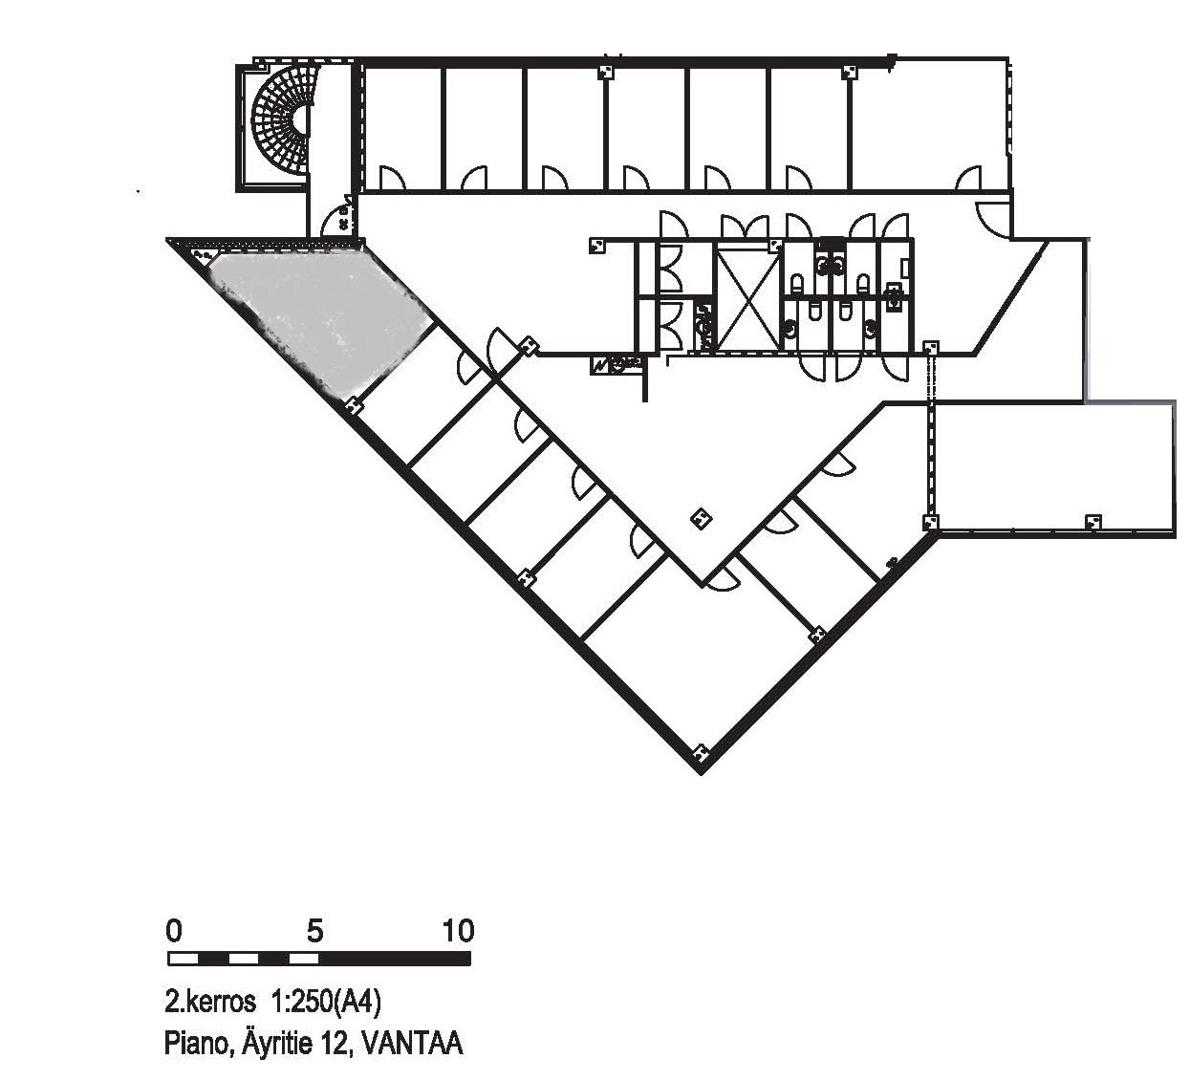 Äyritie 12 A PIANO, 425m2, 2. kerros, Toimistotila